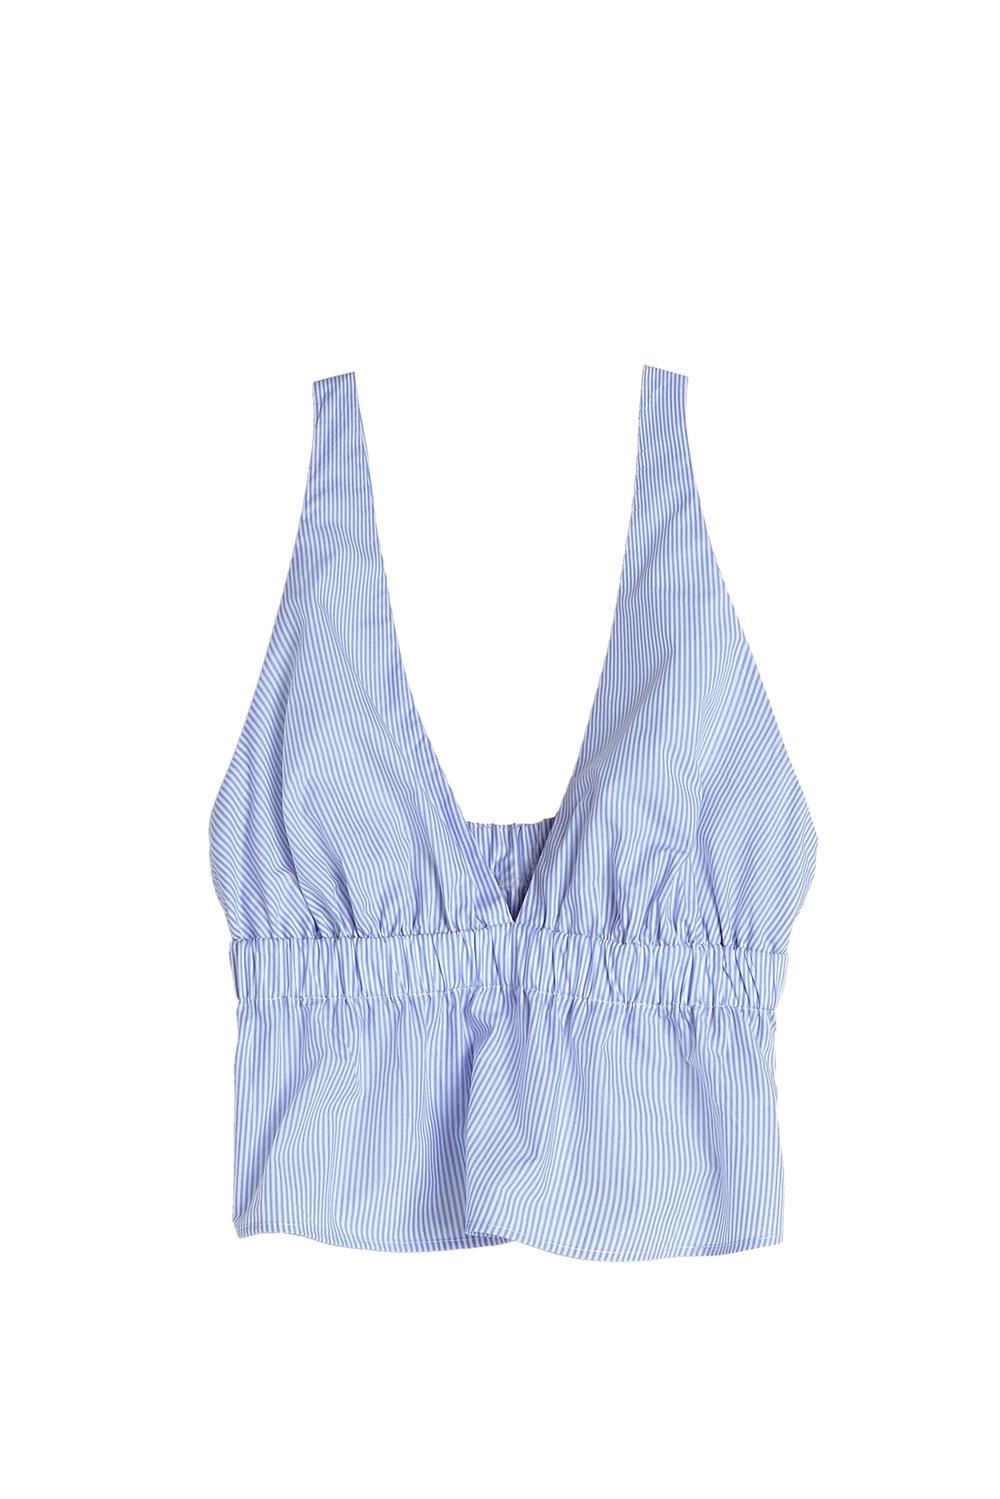 Oysho sleepwear SS17 (14).jpg